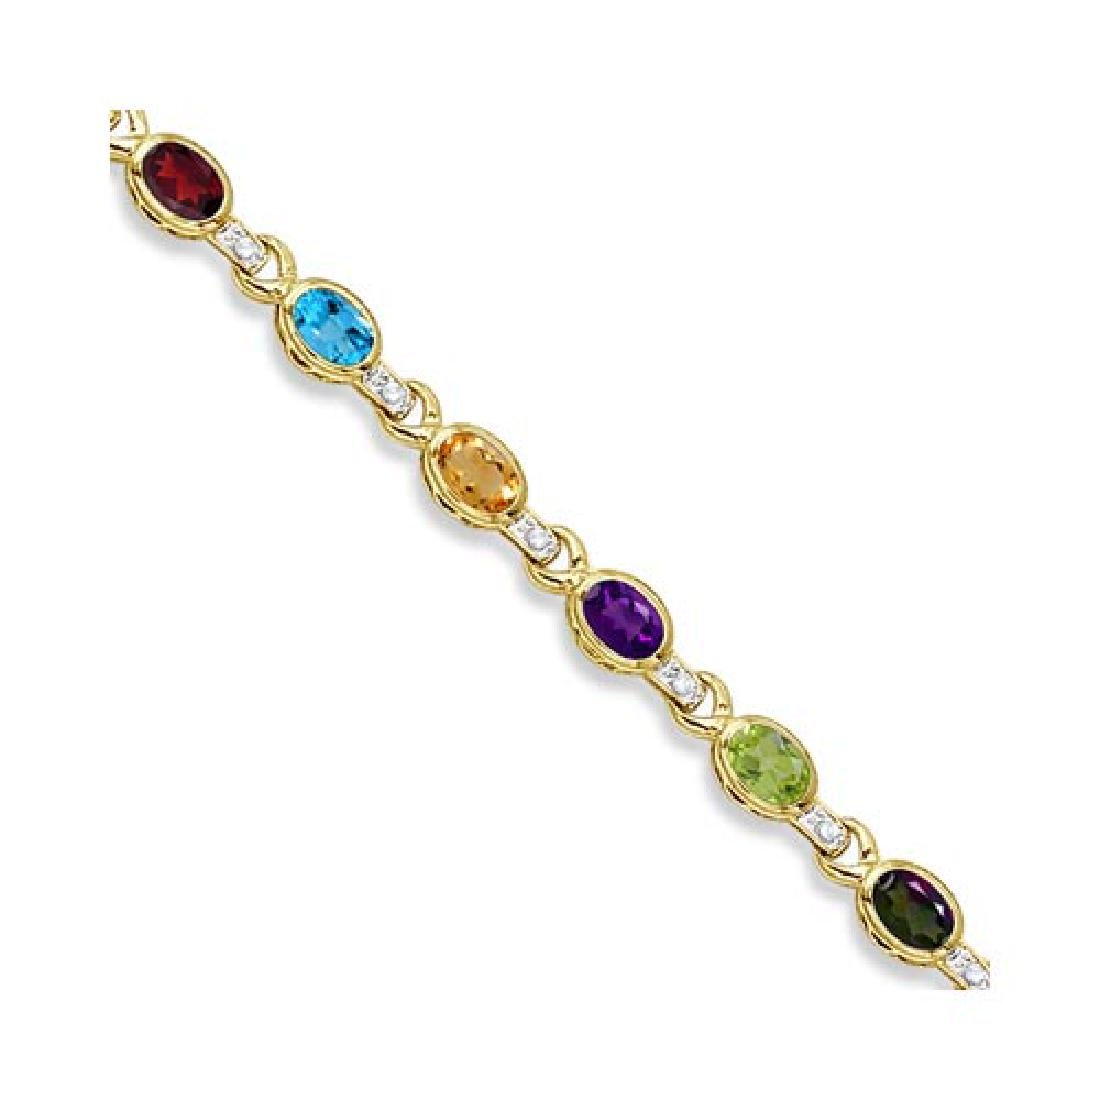 Diamond and Multicolor Gemstone Bracelet 14k Yellow Gol